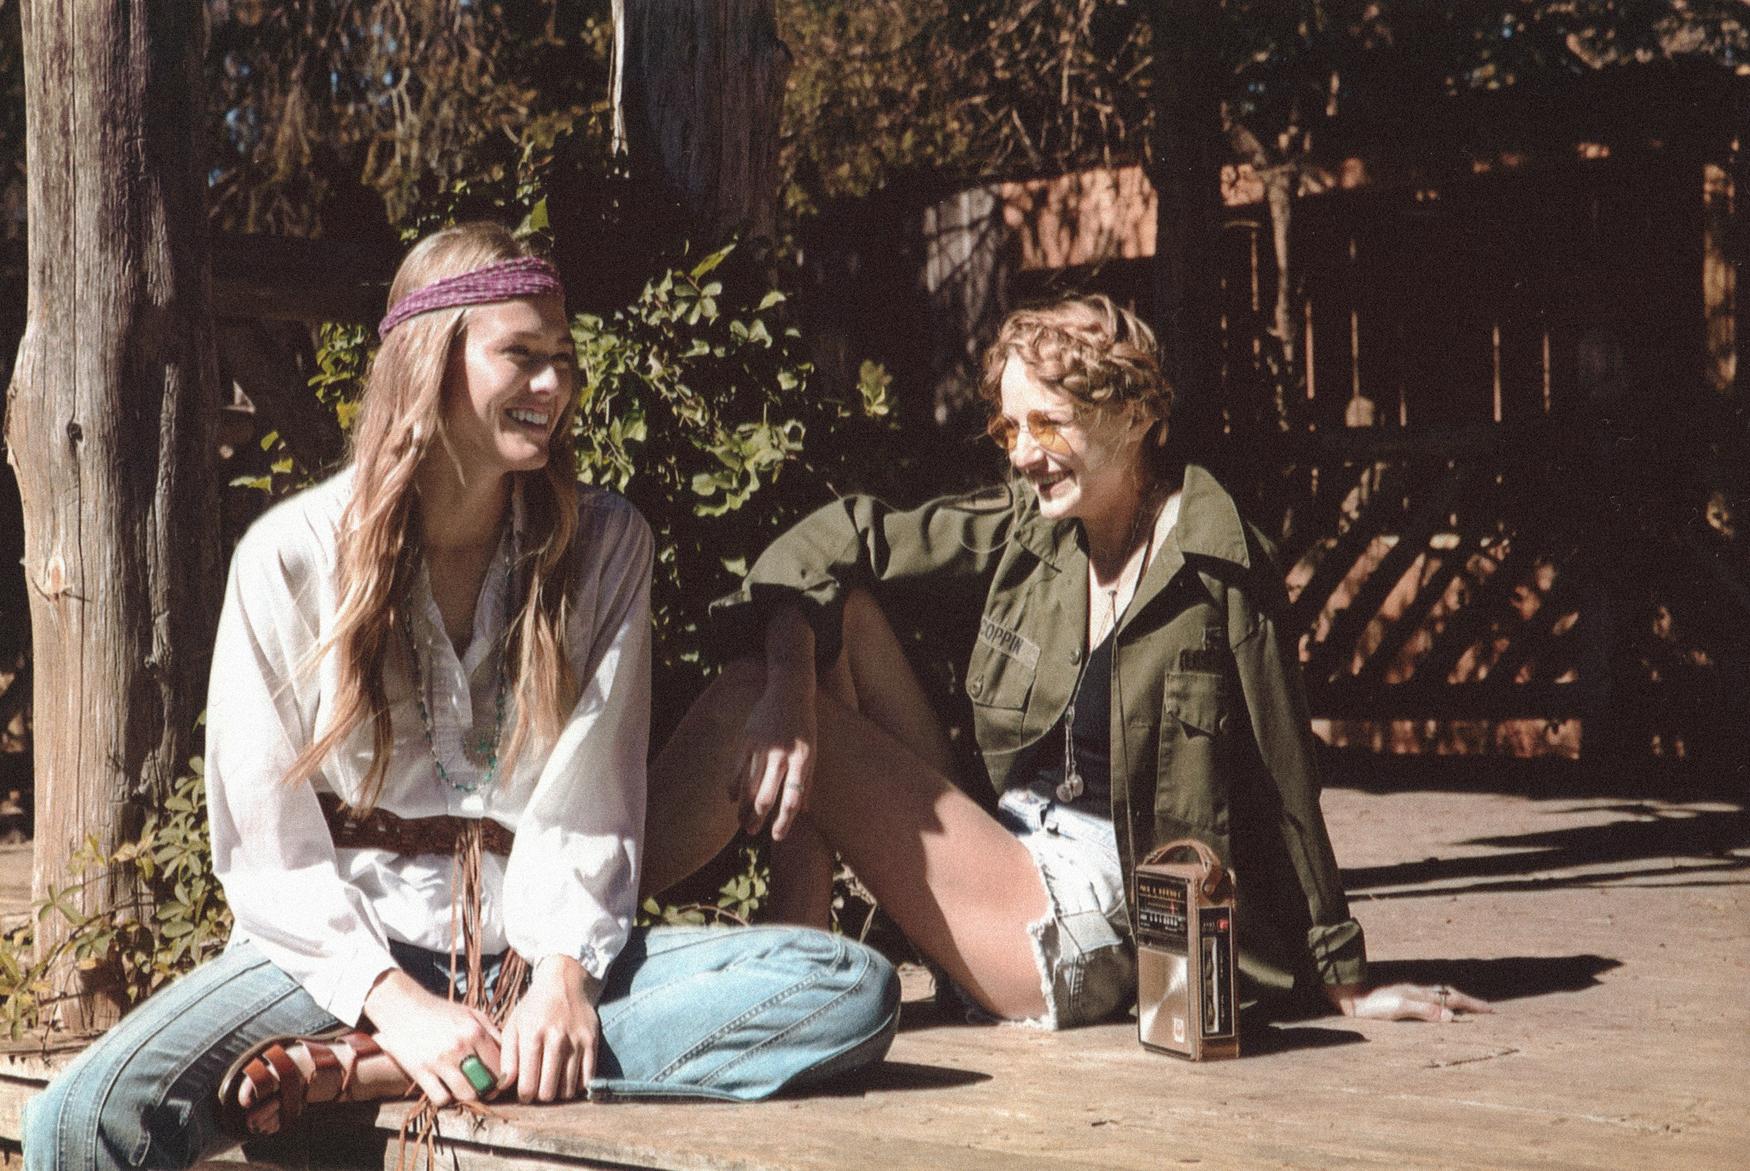 1960s-Youth-Lifestyle-5.jpg